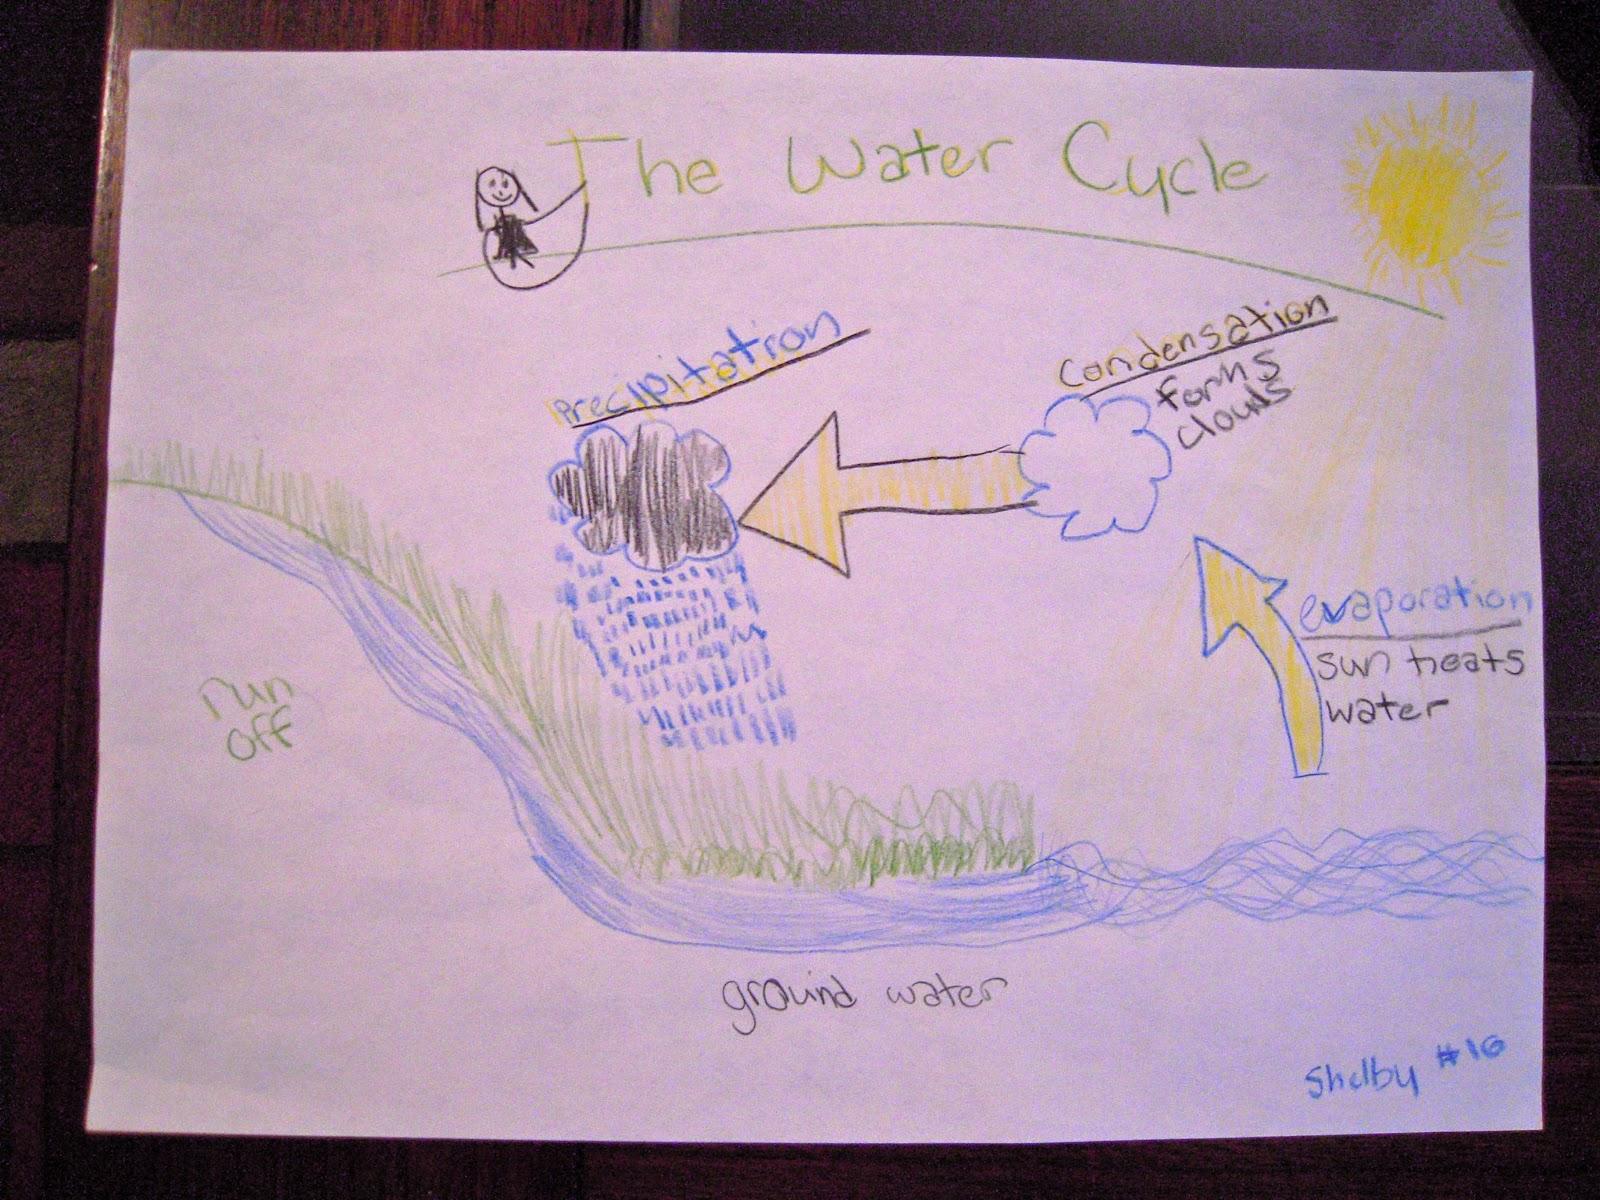 water cycle diagram worksheet to label 2002 honda civic si radio wiring mrs mcdonald 39s 4th grade the